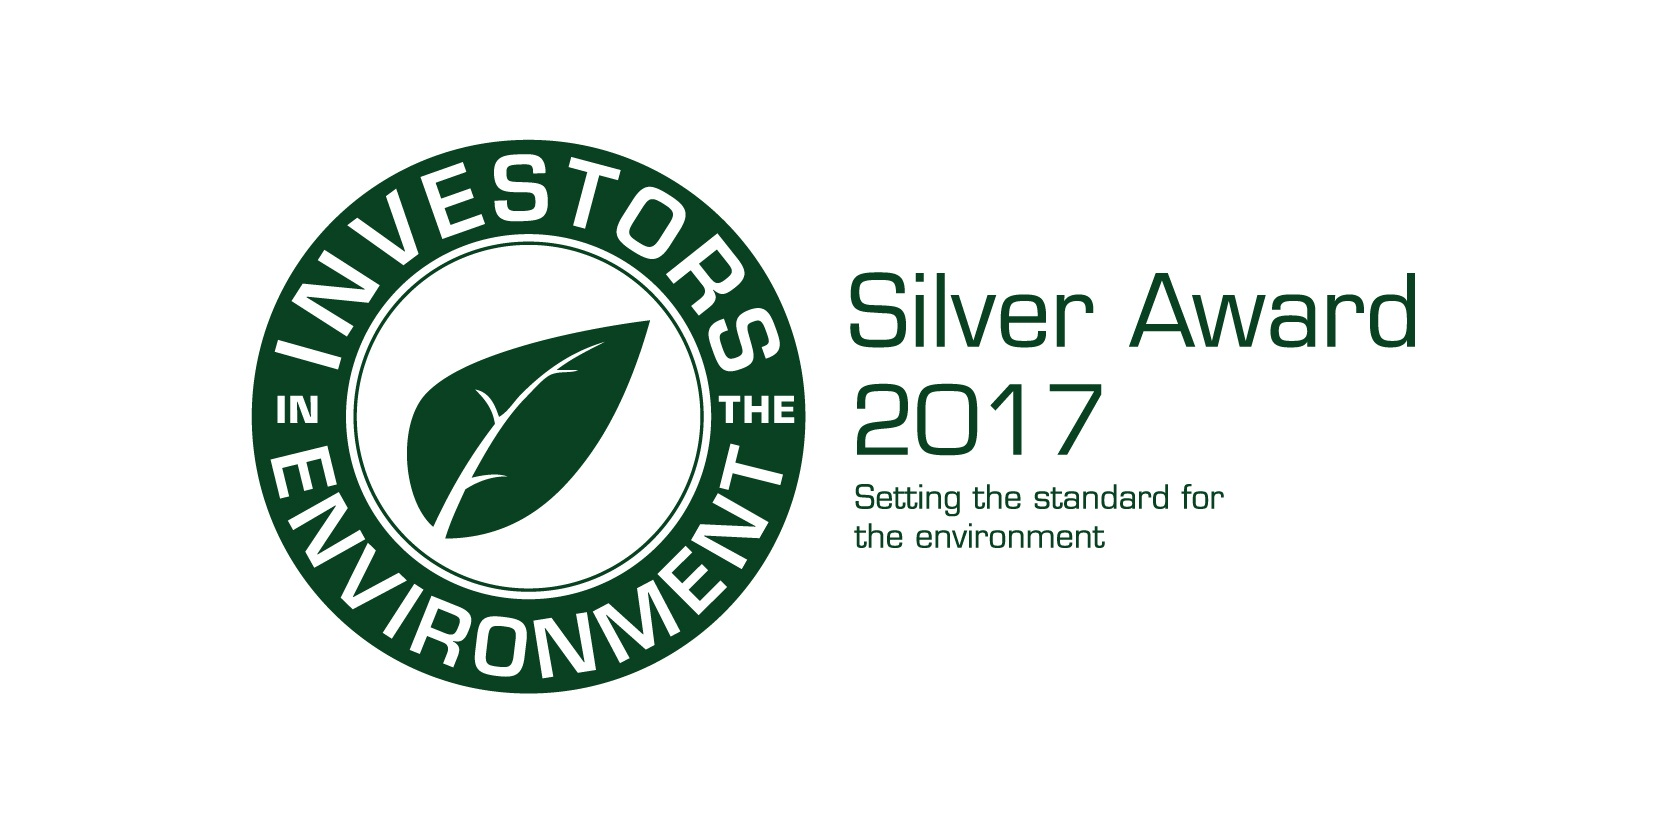 Investors in environment Silver Award 2017C (002)